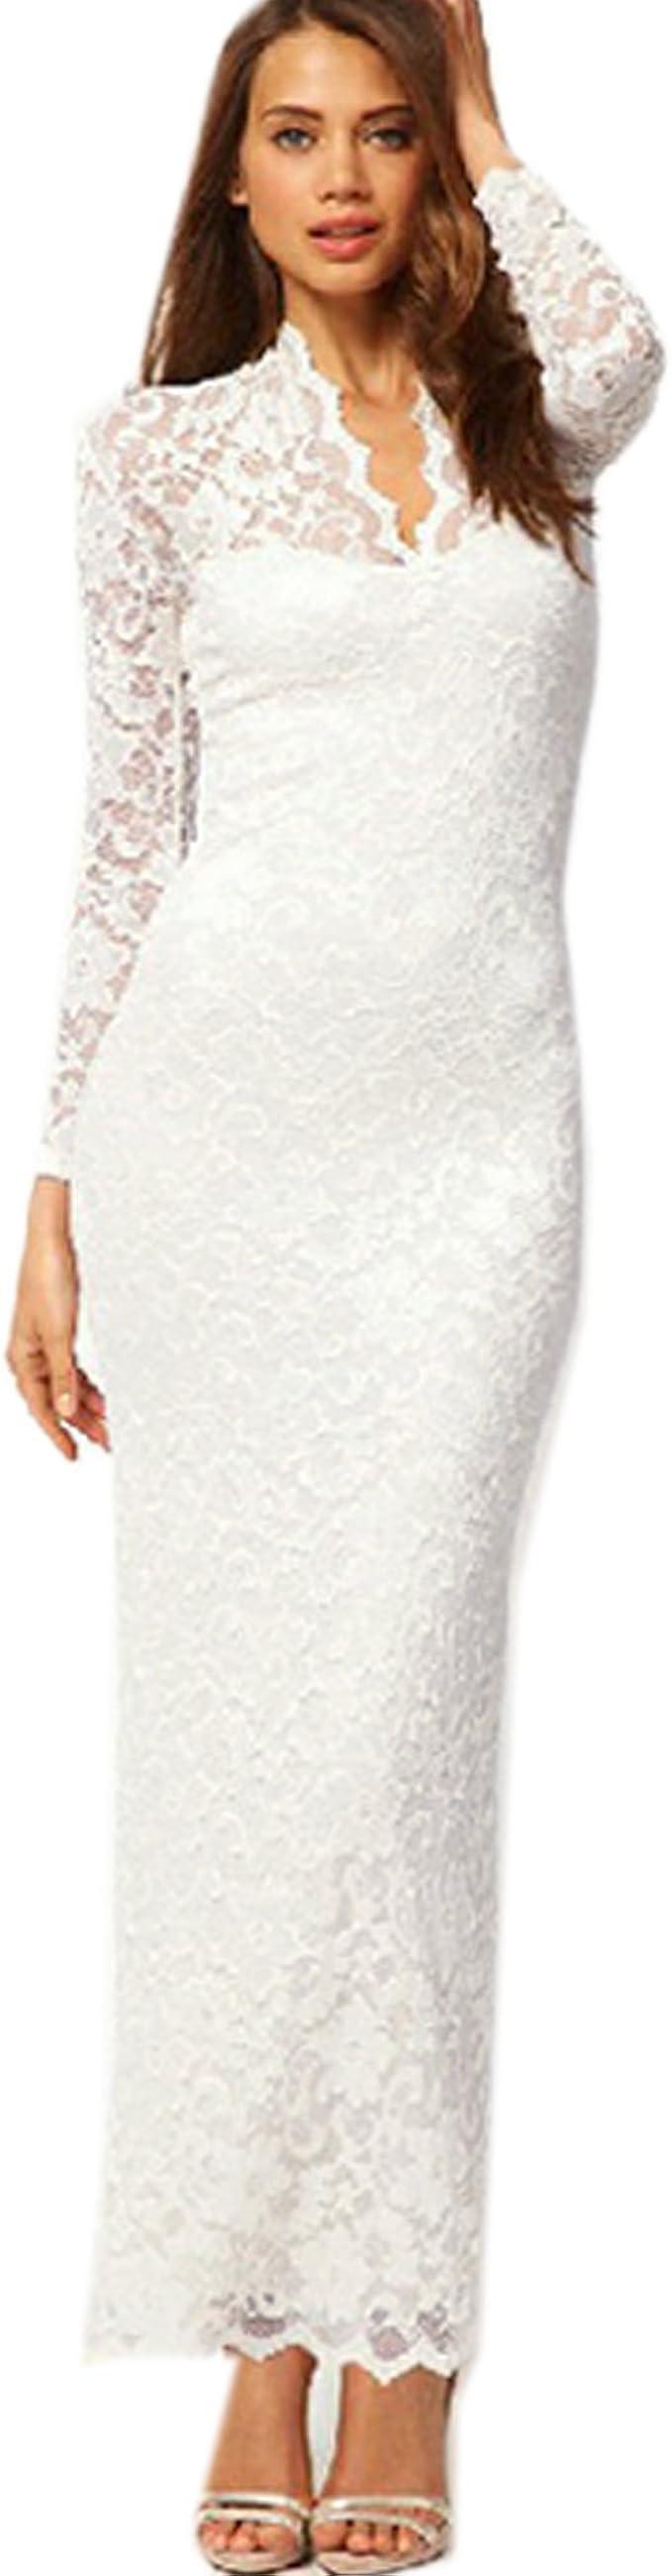 Damen Figur betontes langes Studio Abendkleid mit Spitze Kleid